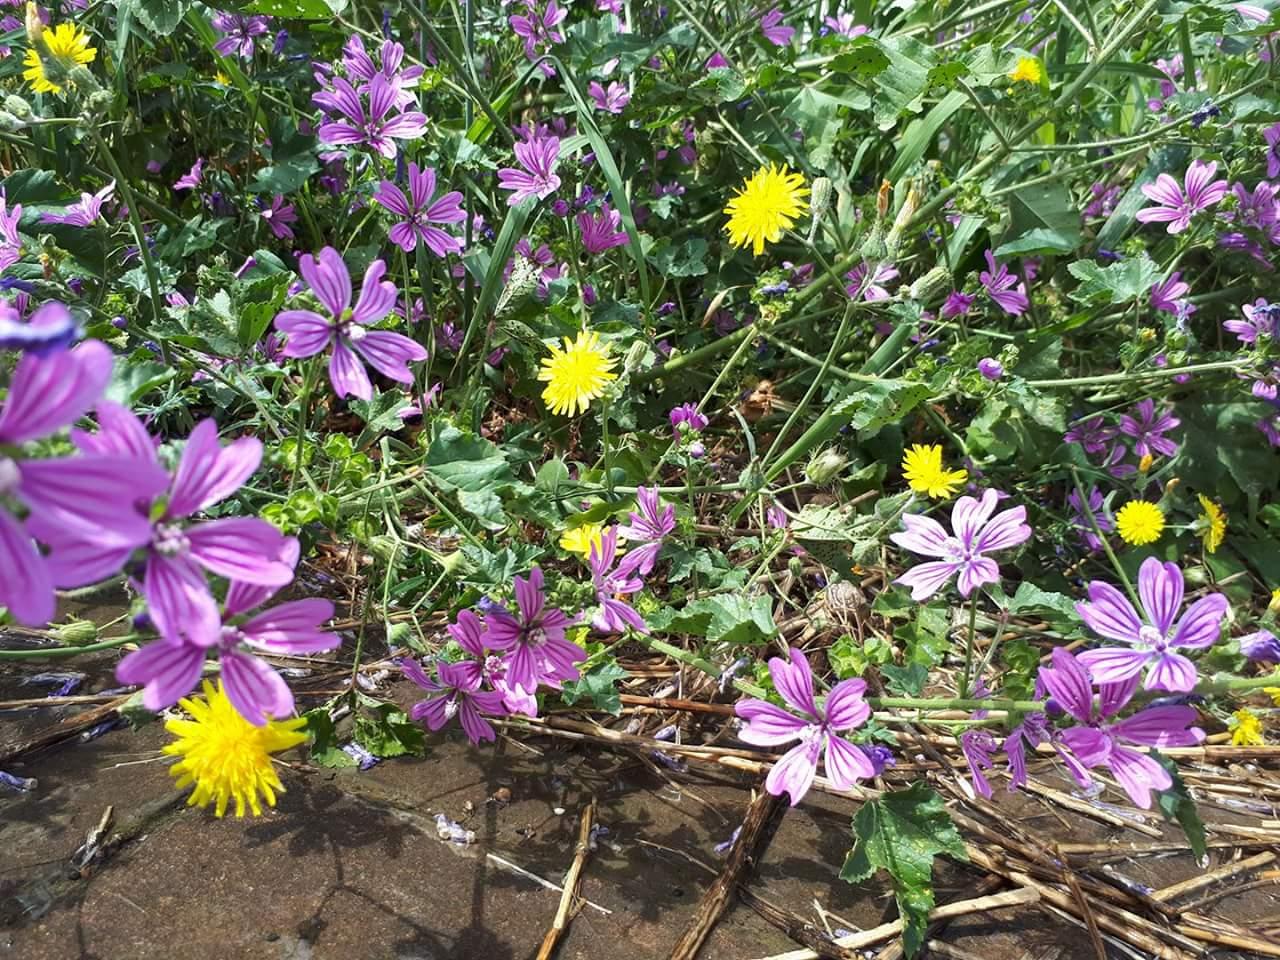 mangiaradio-2-25-sapori-di-primavera